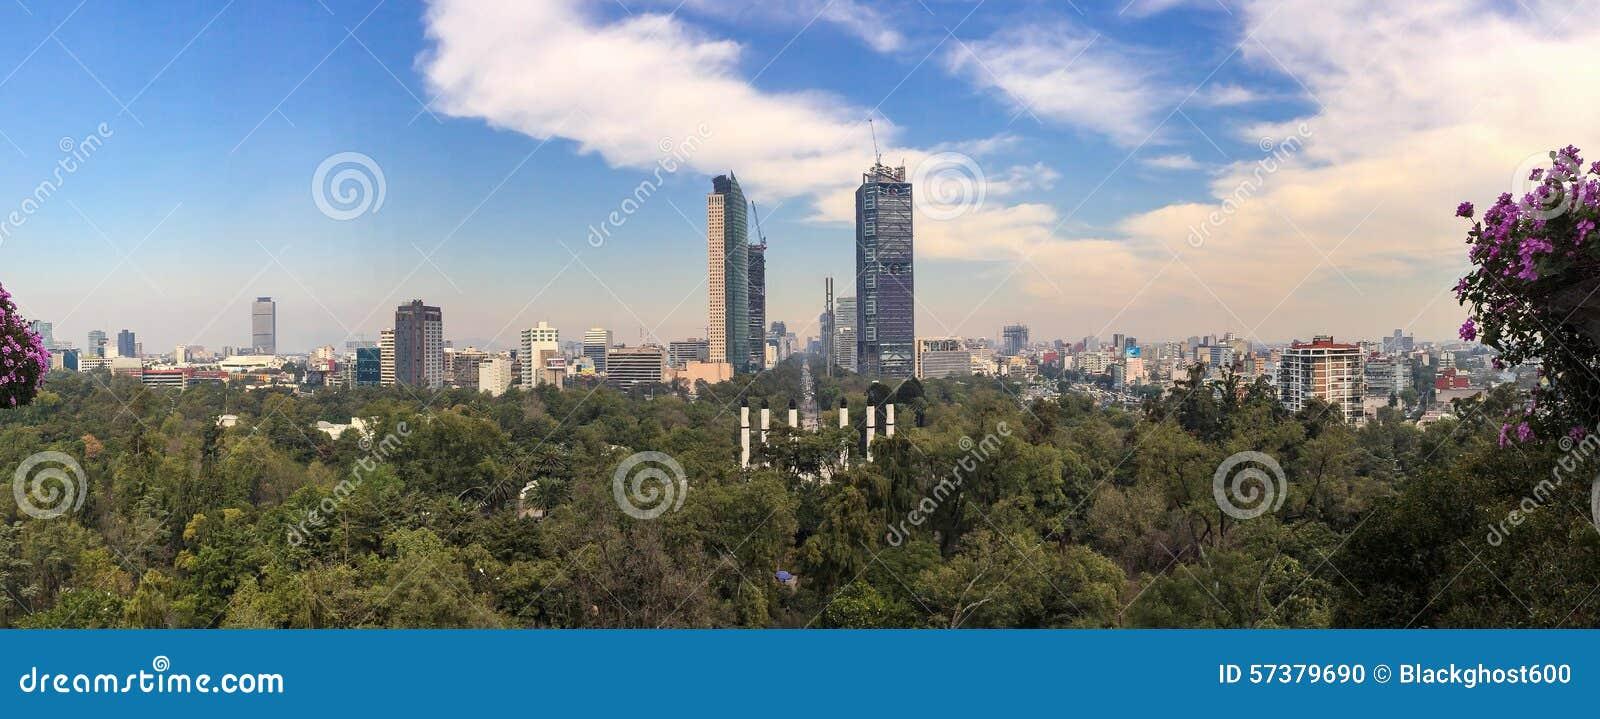 Meksyk Reforma panorama